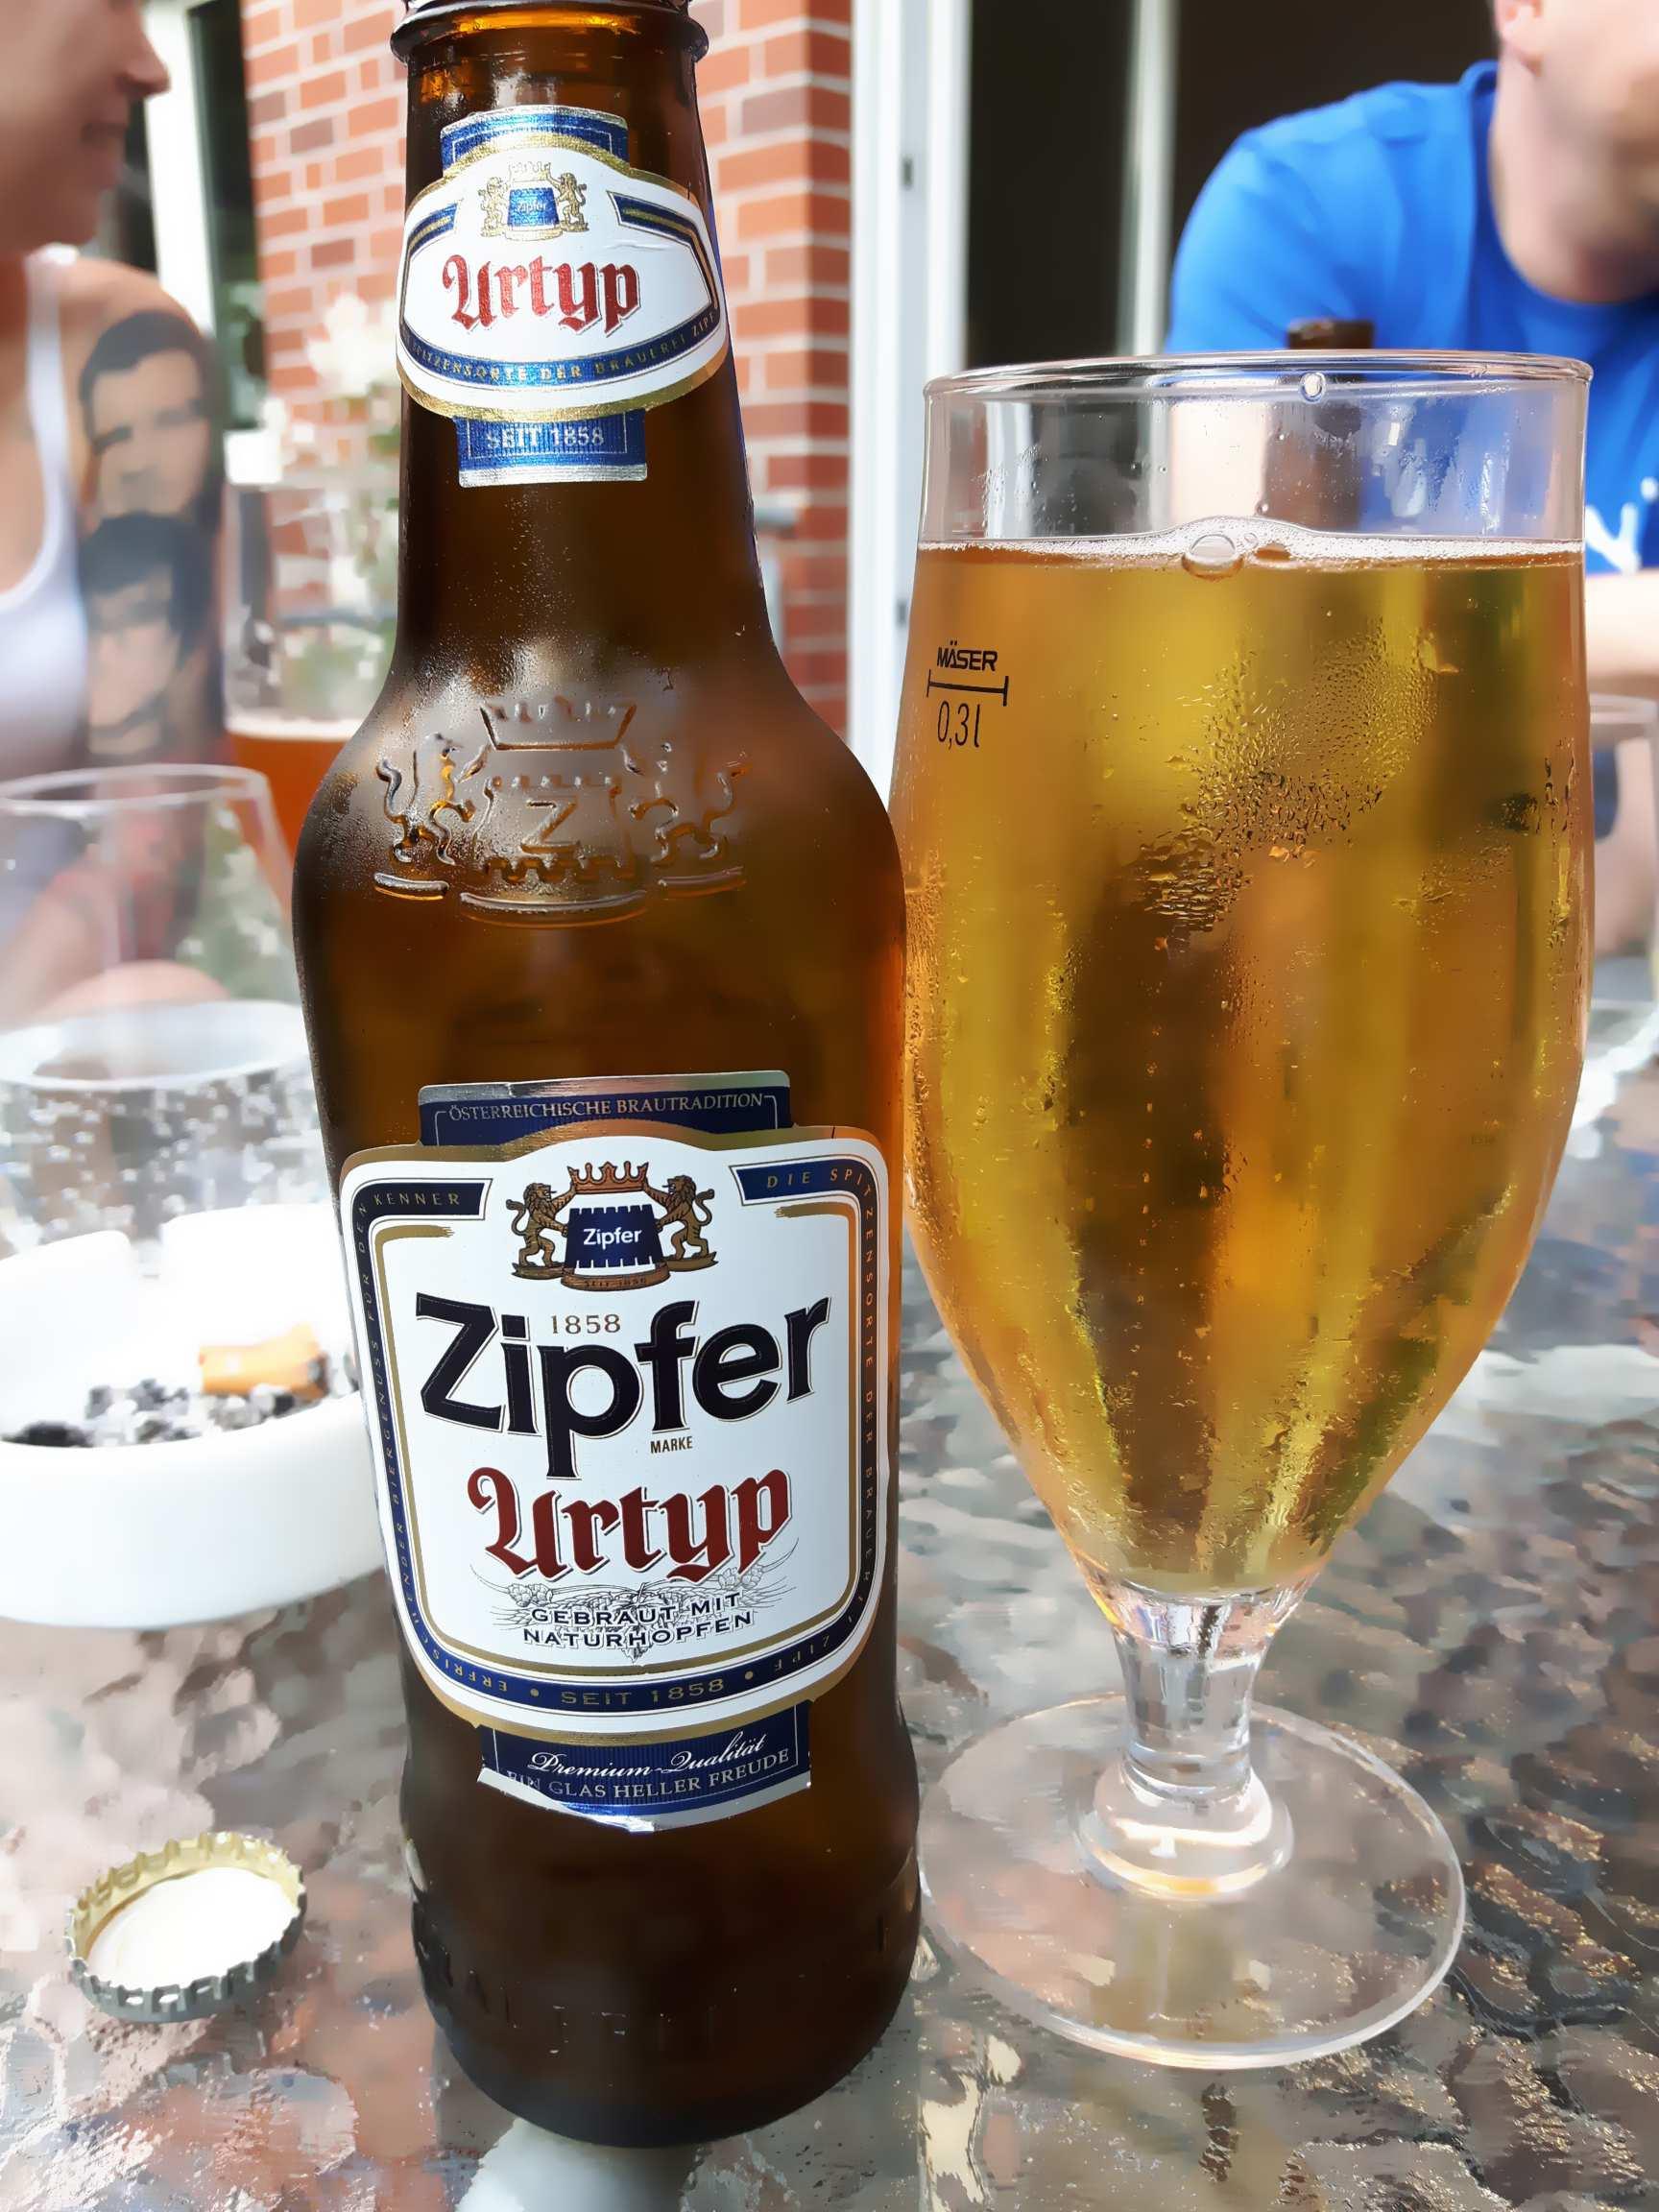 Zipfer_Urtyp